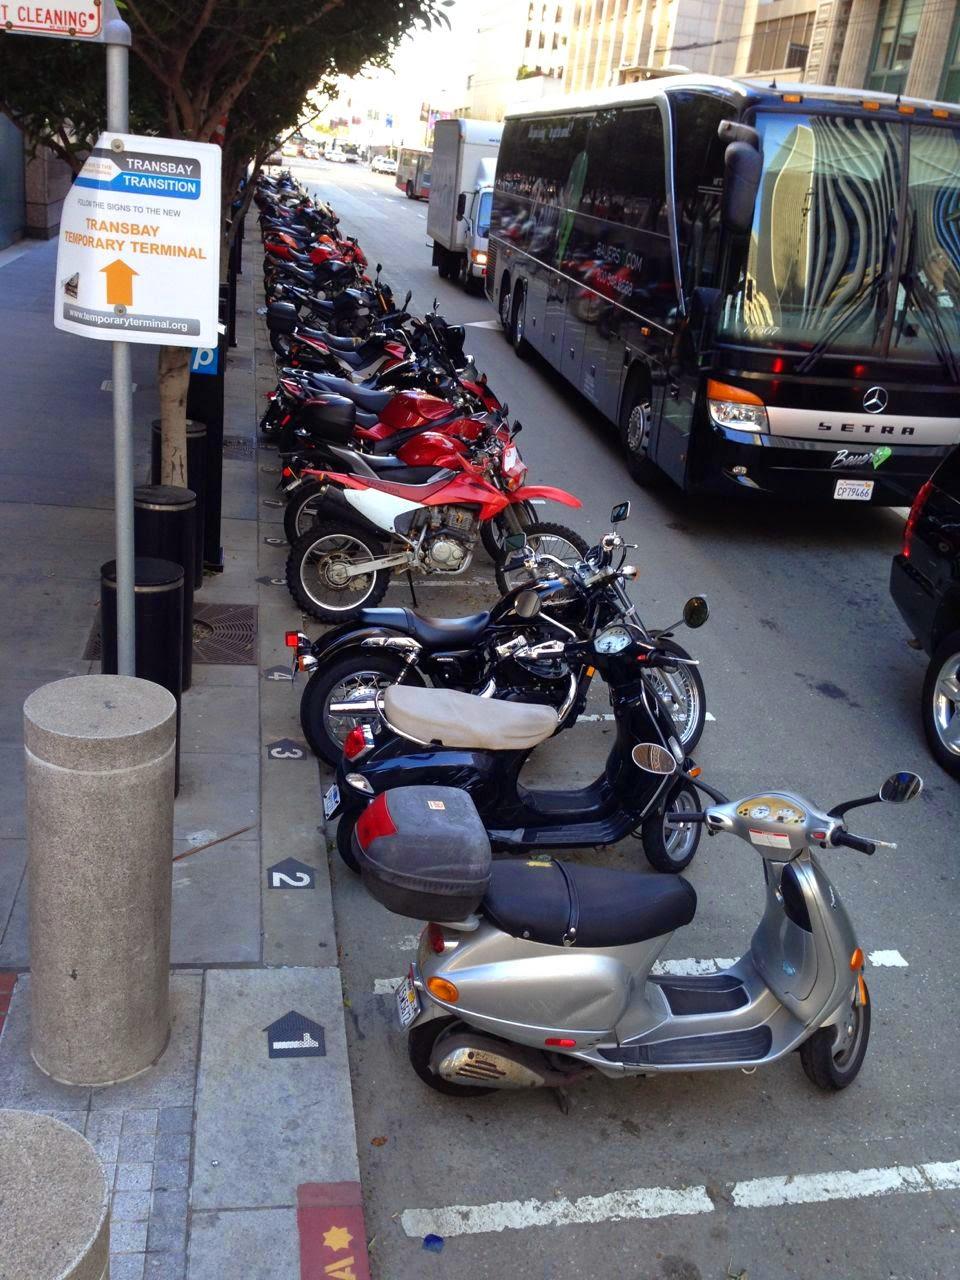 Metered motorcycle parking in Downtown